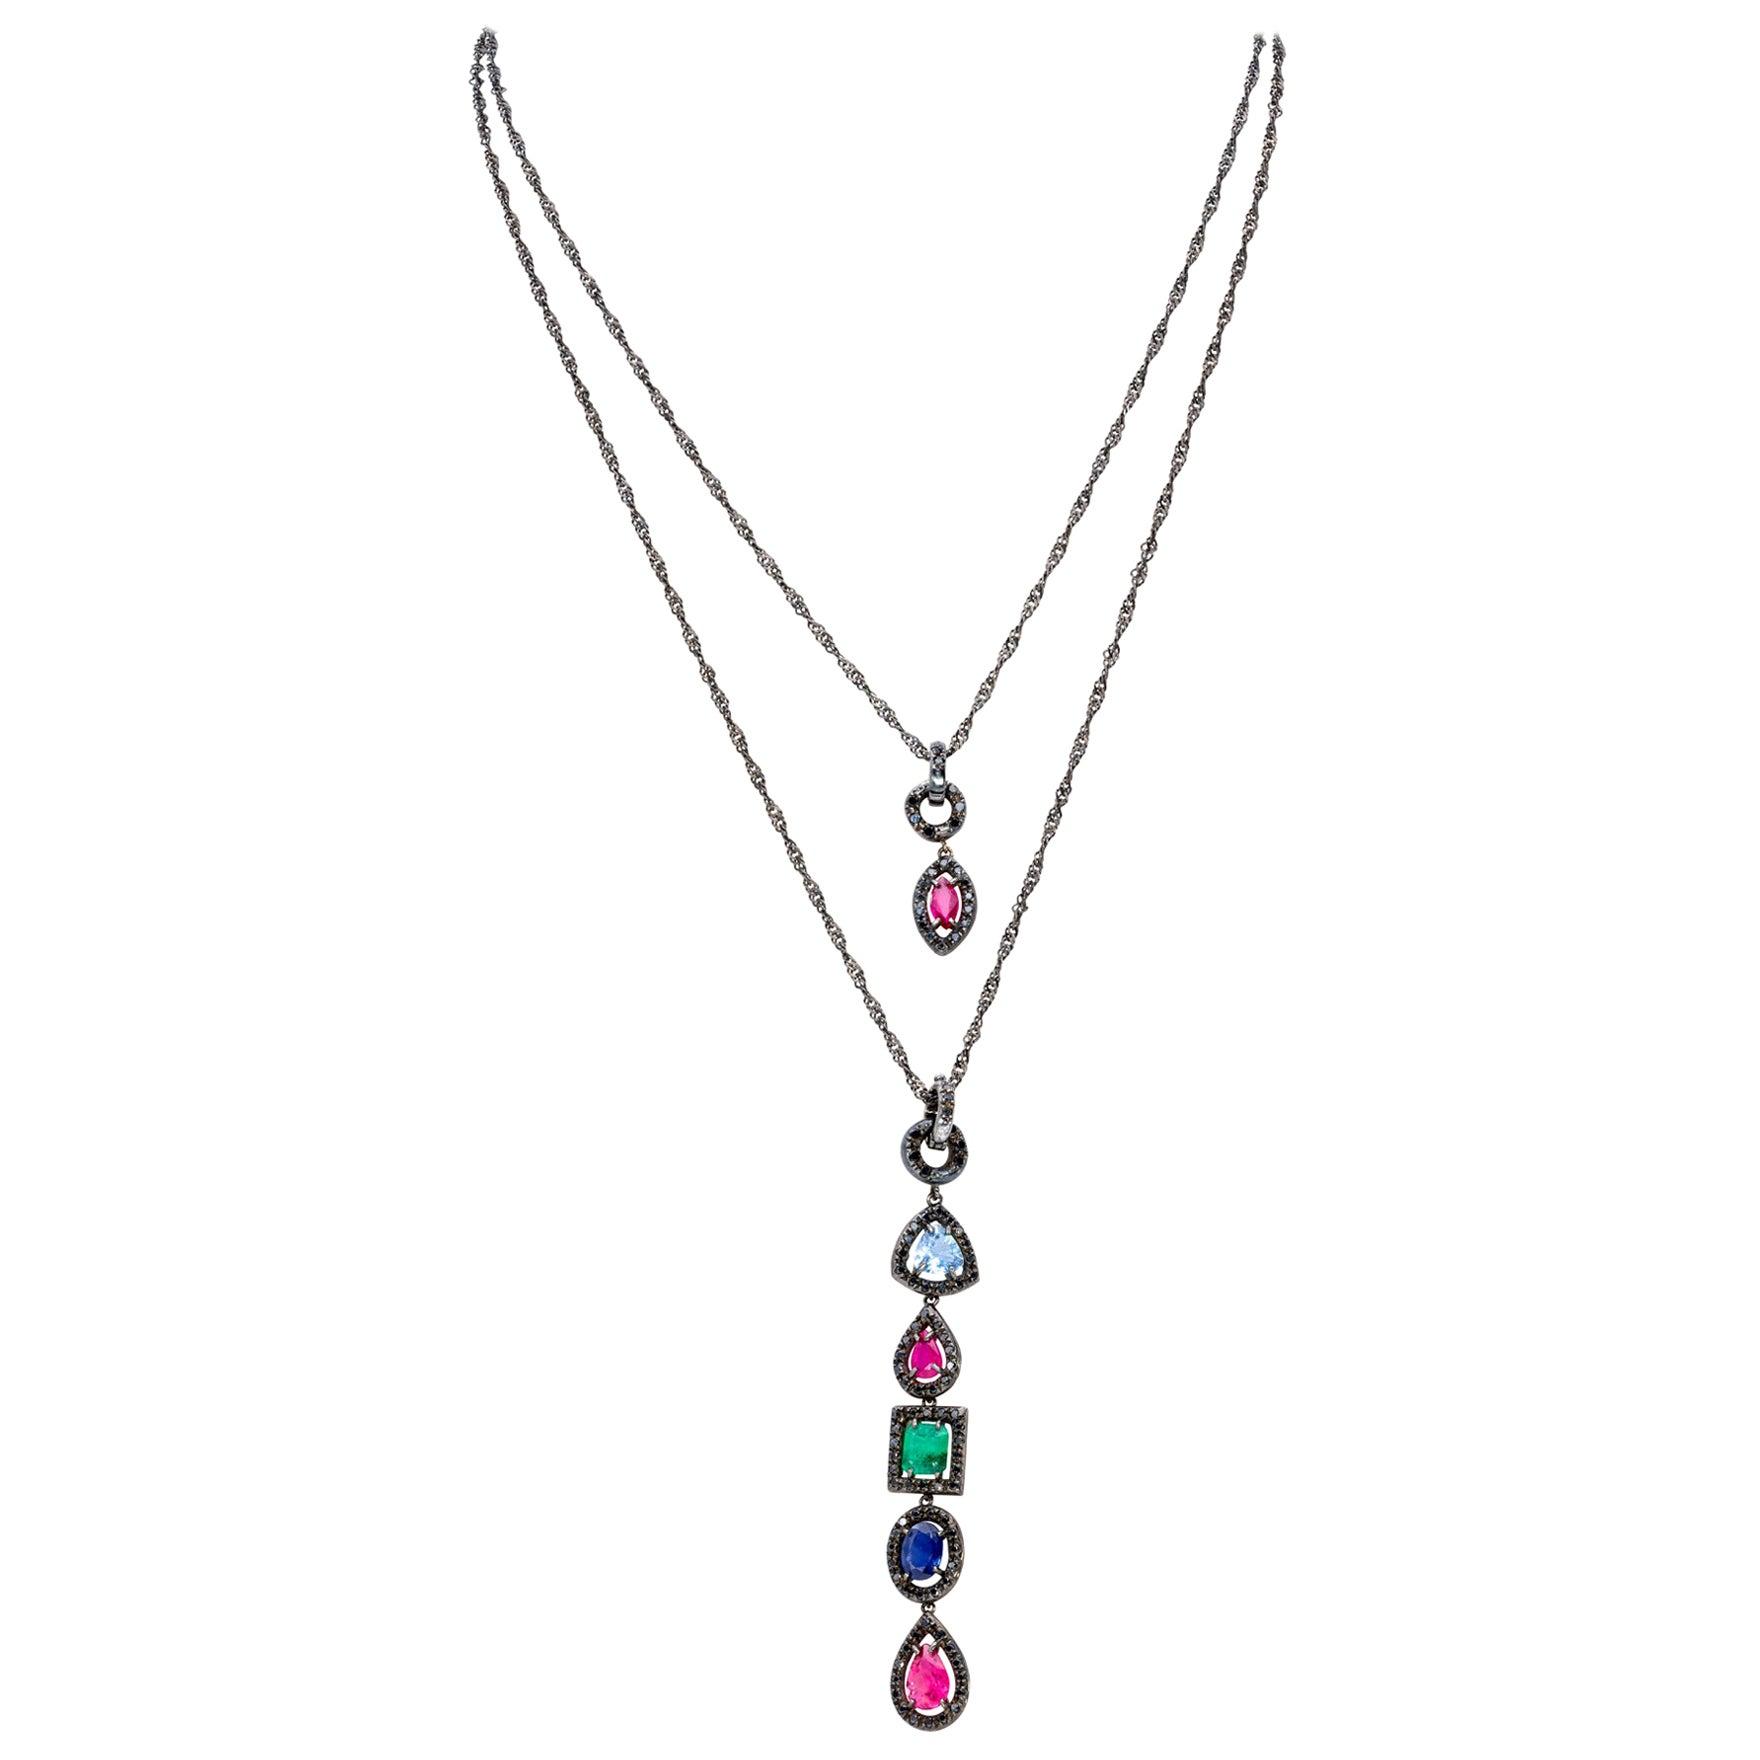 Pendants in Precious Stones and Black Diamonds from d'Avossa Rainbow Collection